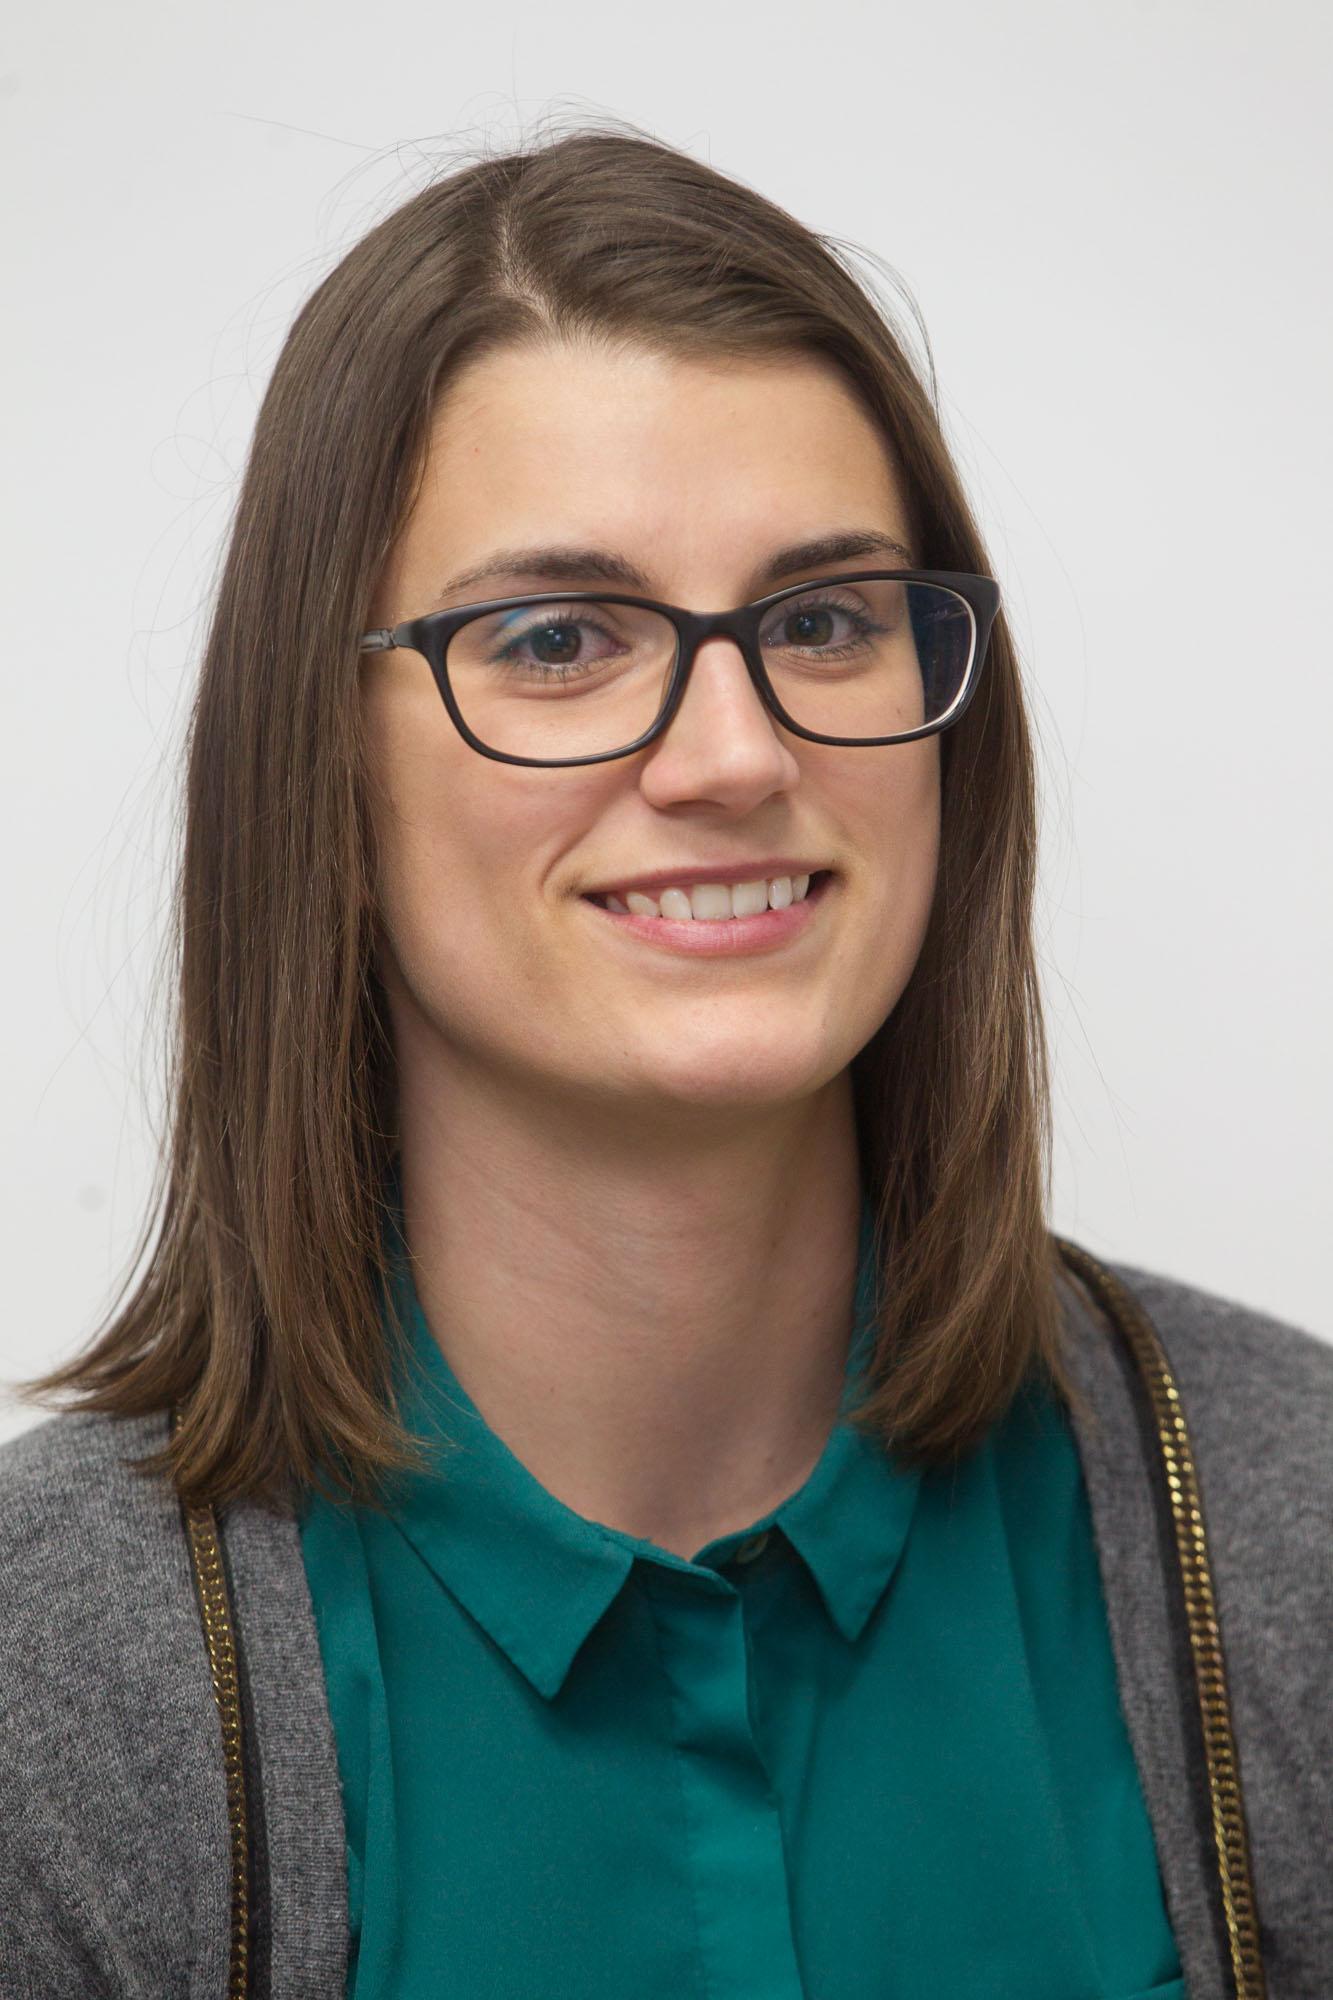 Alexandra Meissner